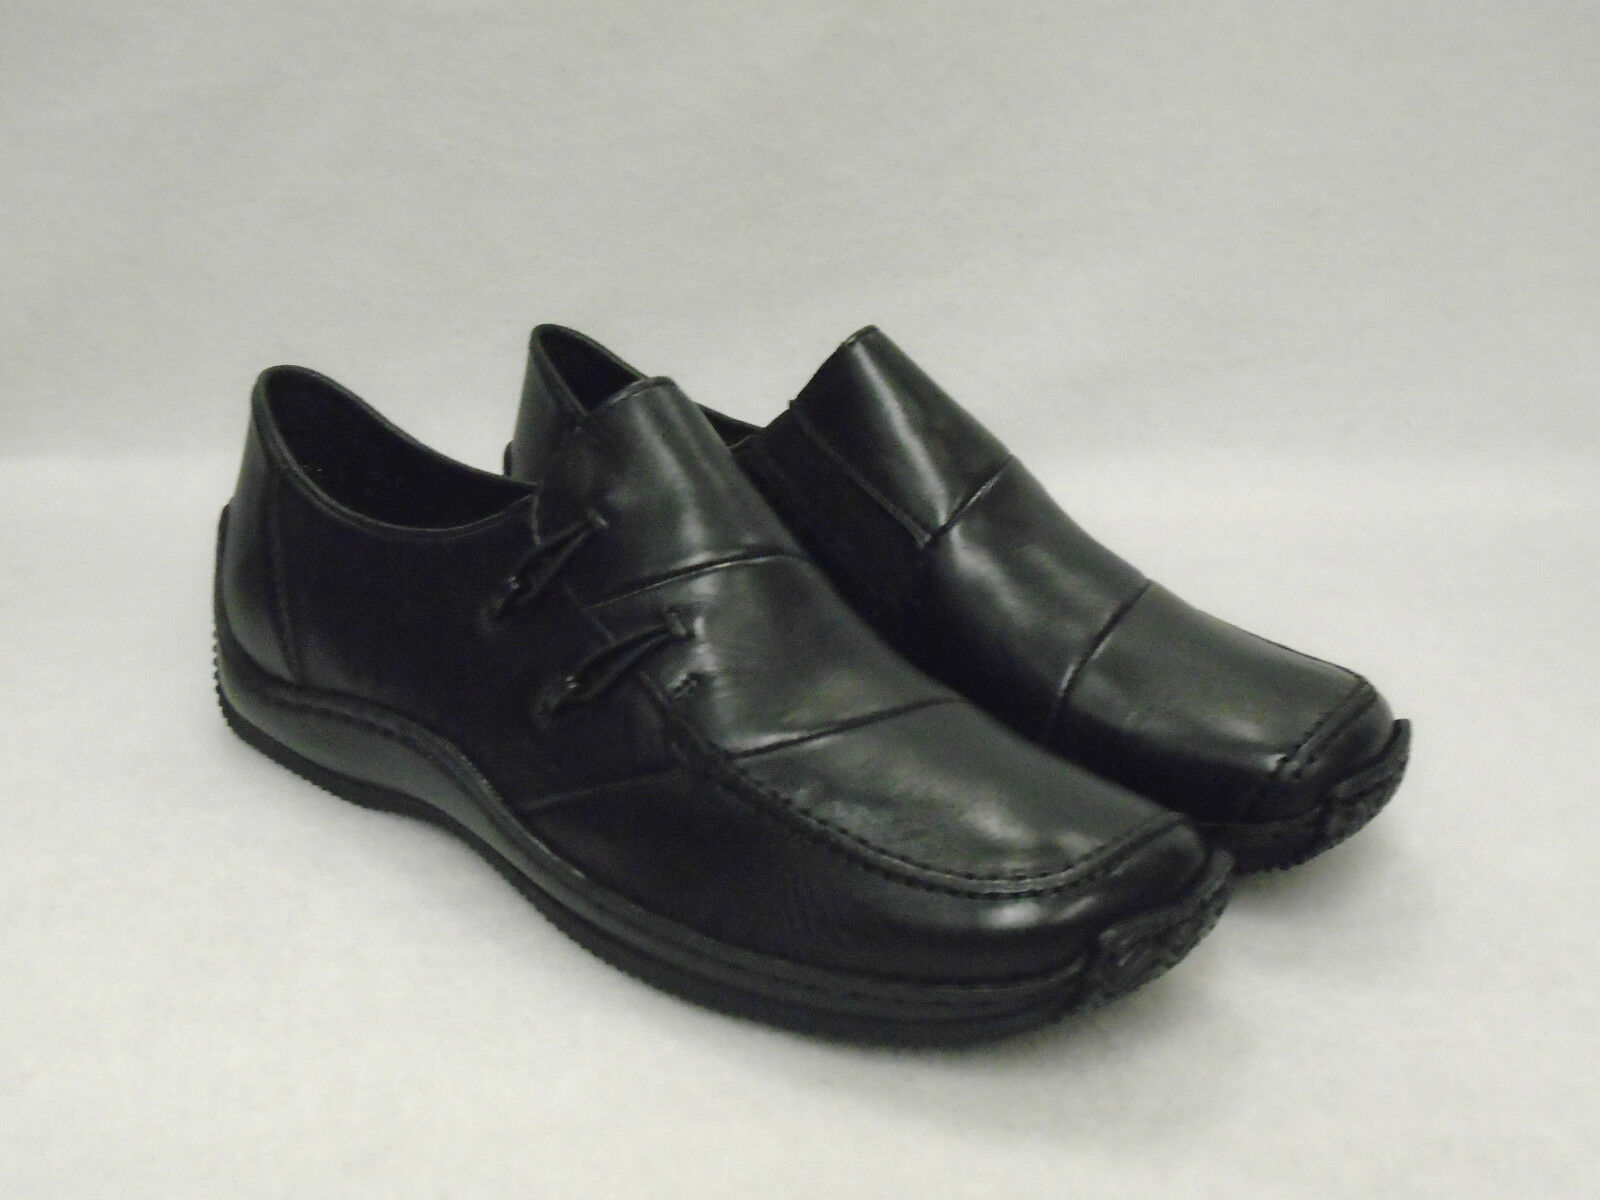 RIEKER LADIES CLOSED IN Schuhe 'L1762' BLACK LEATHER